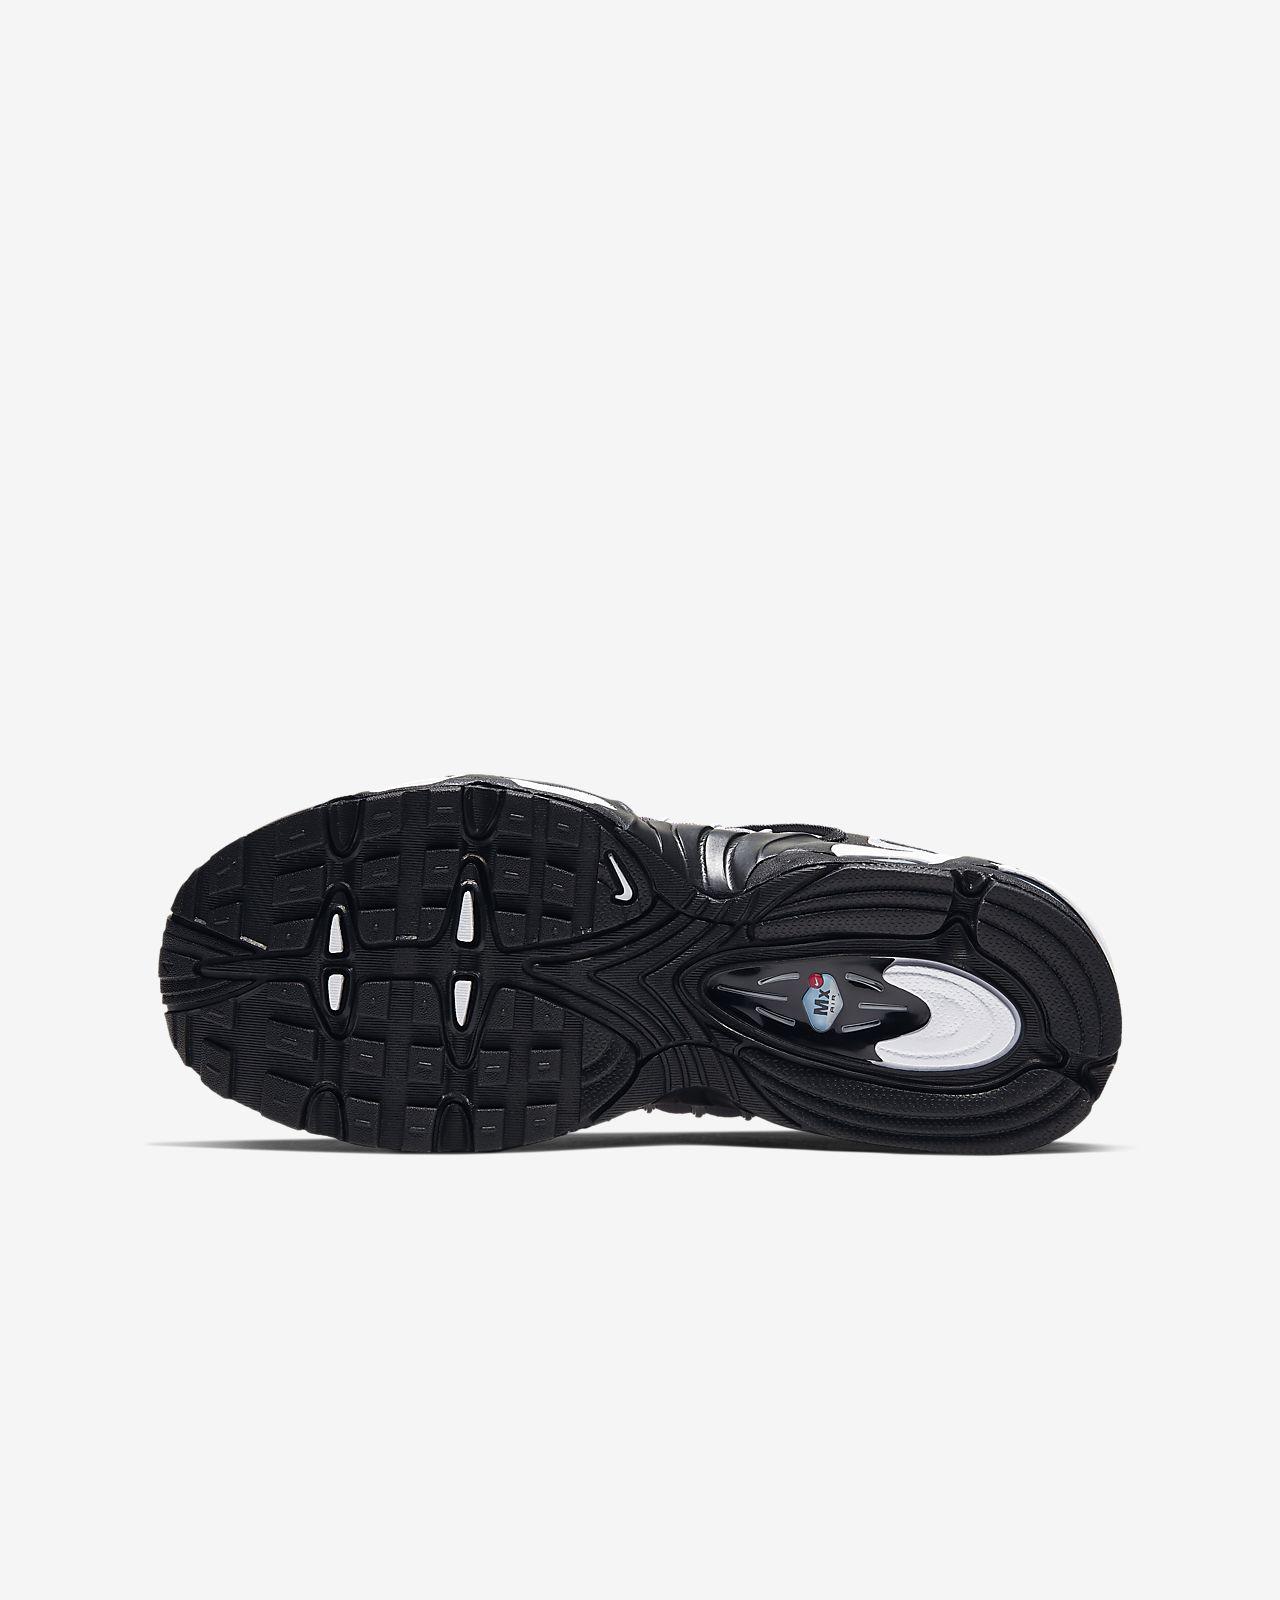 Air Tailwind IV SP sko til store barn